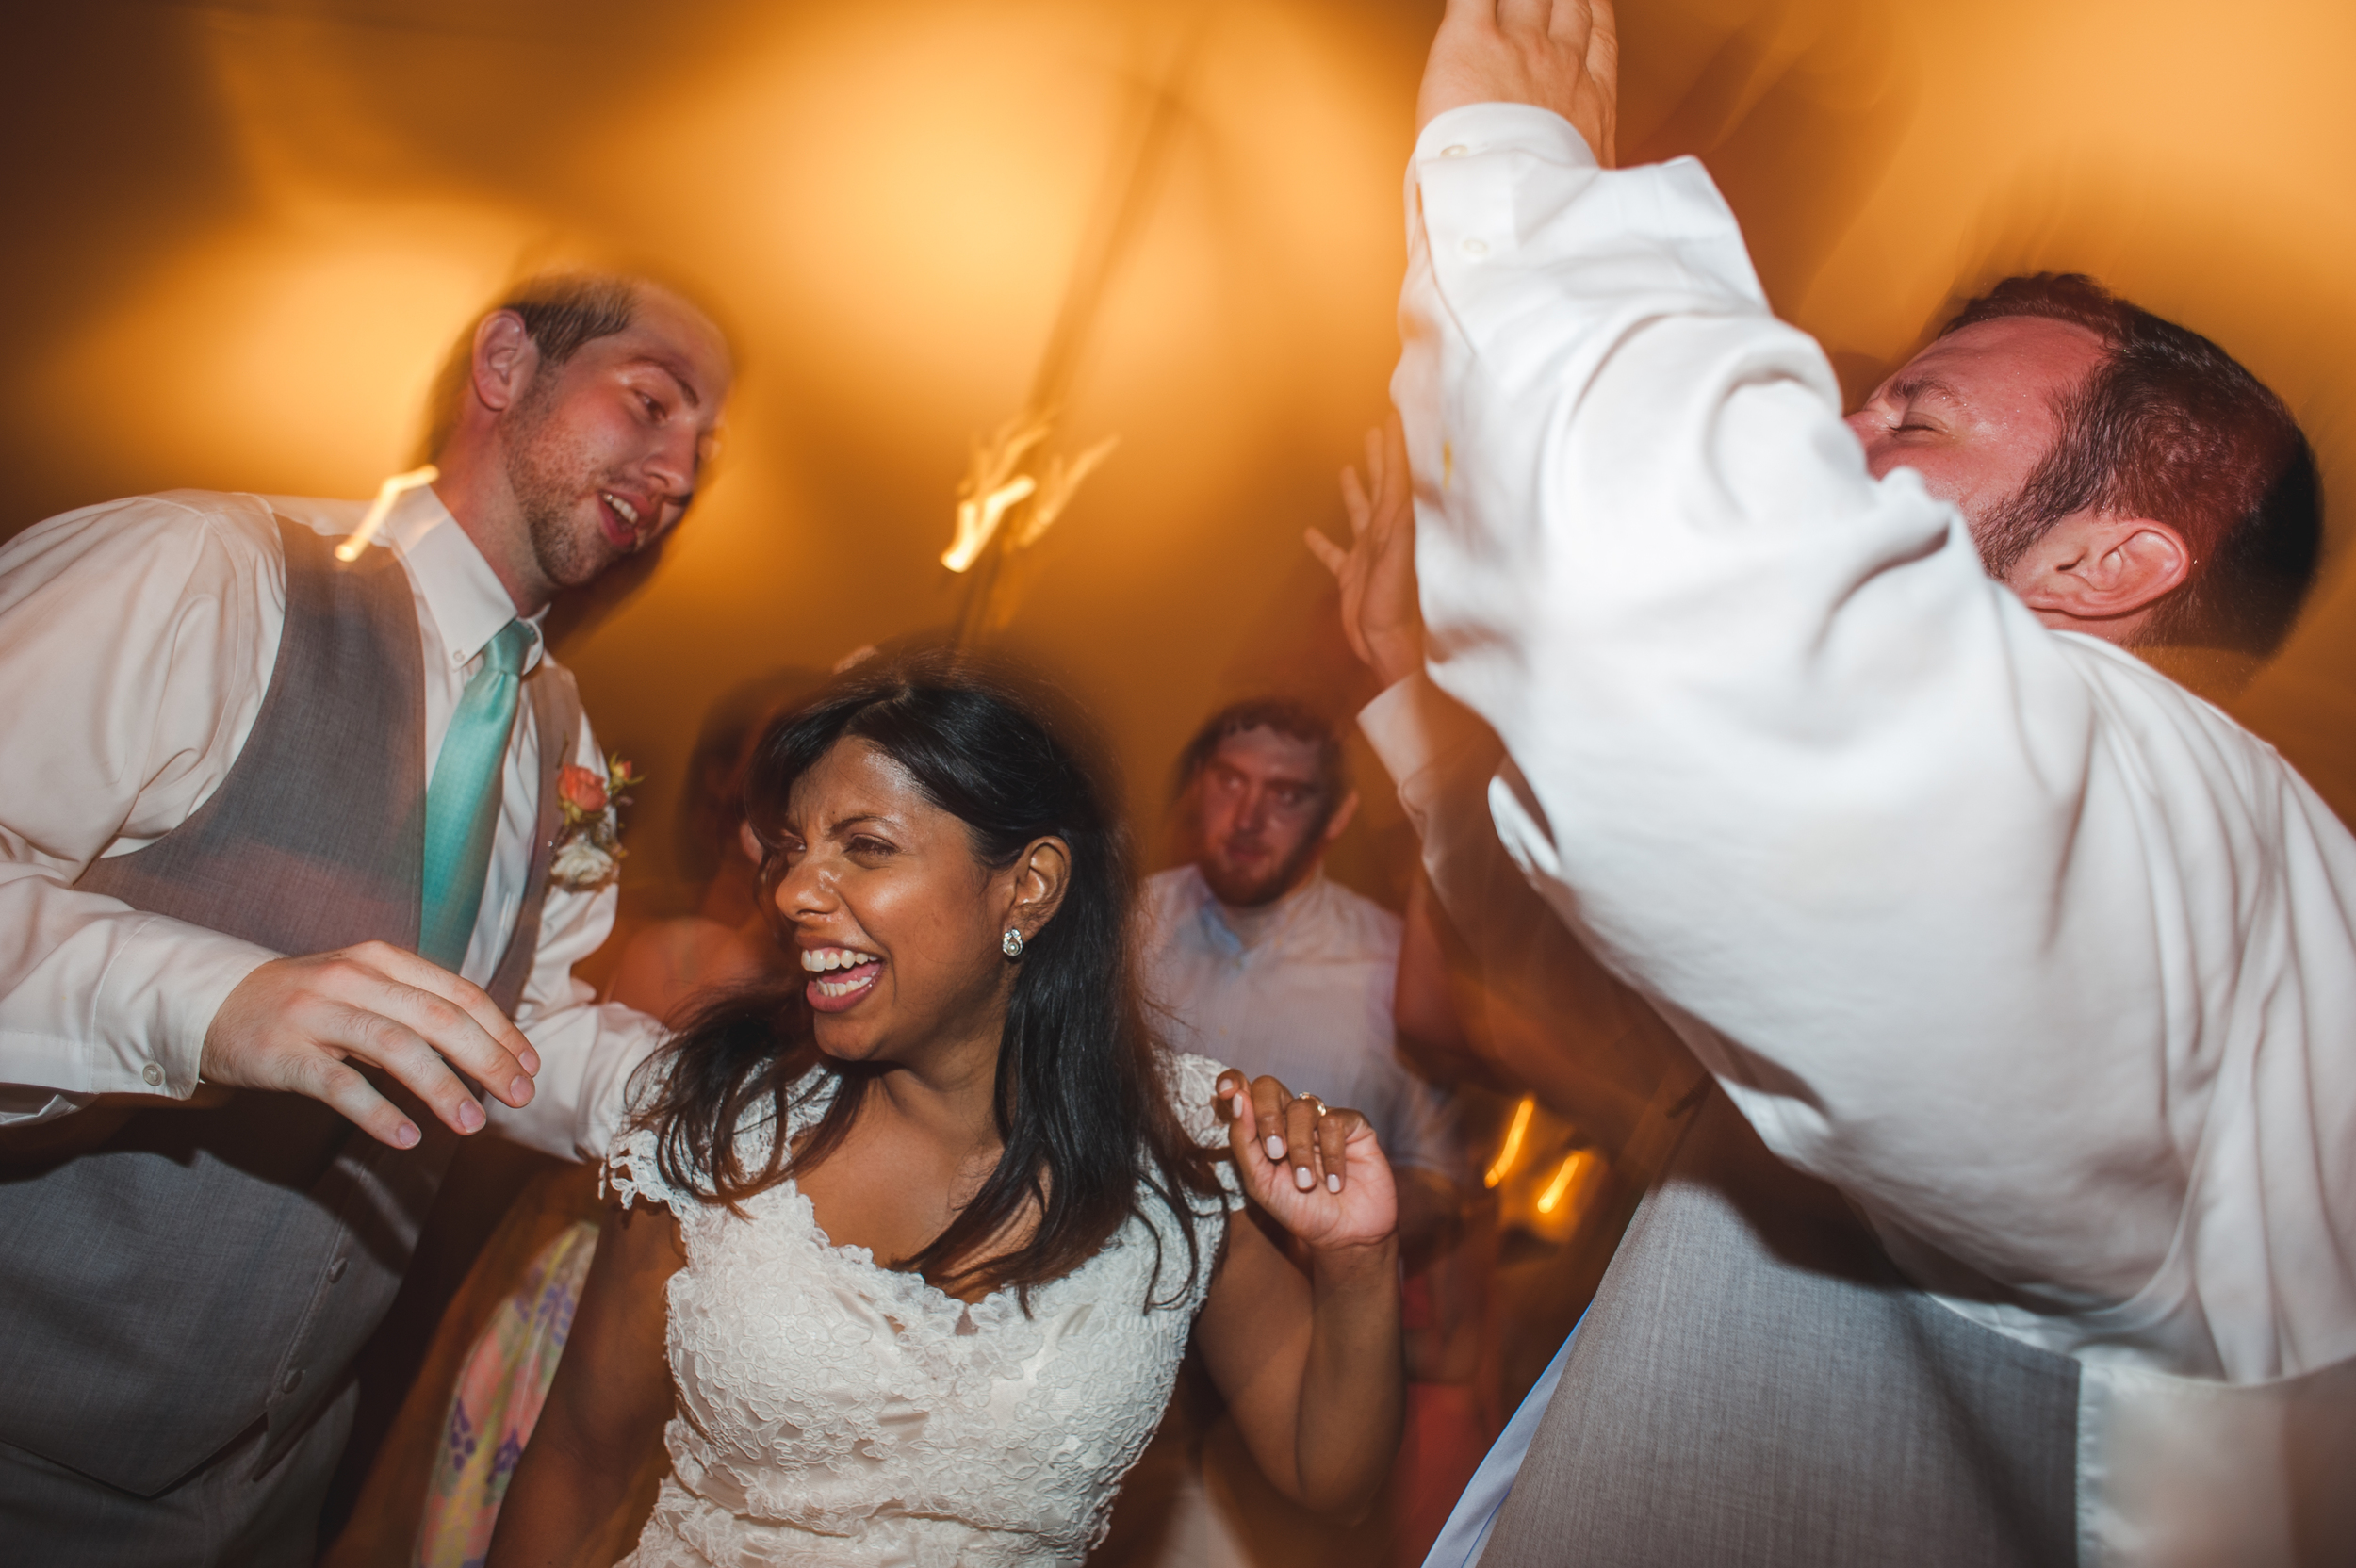 Artistic Wedding Photographer Mantas Kubilinskas-28.jpg